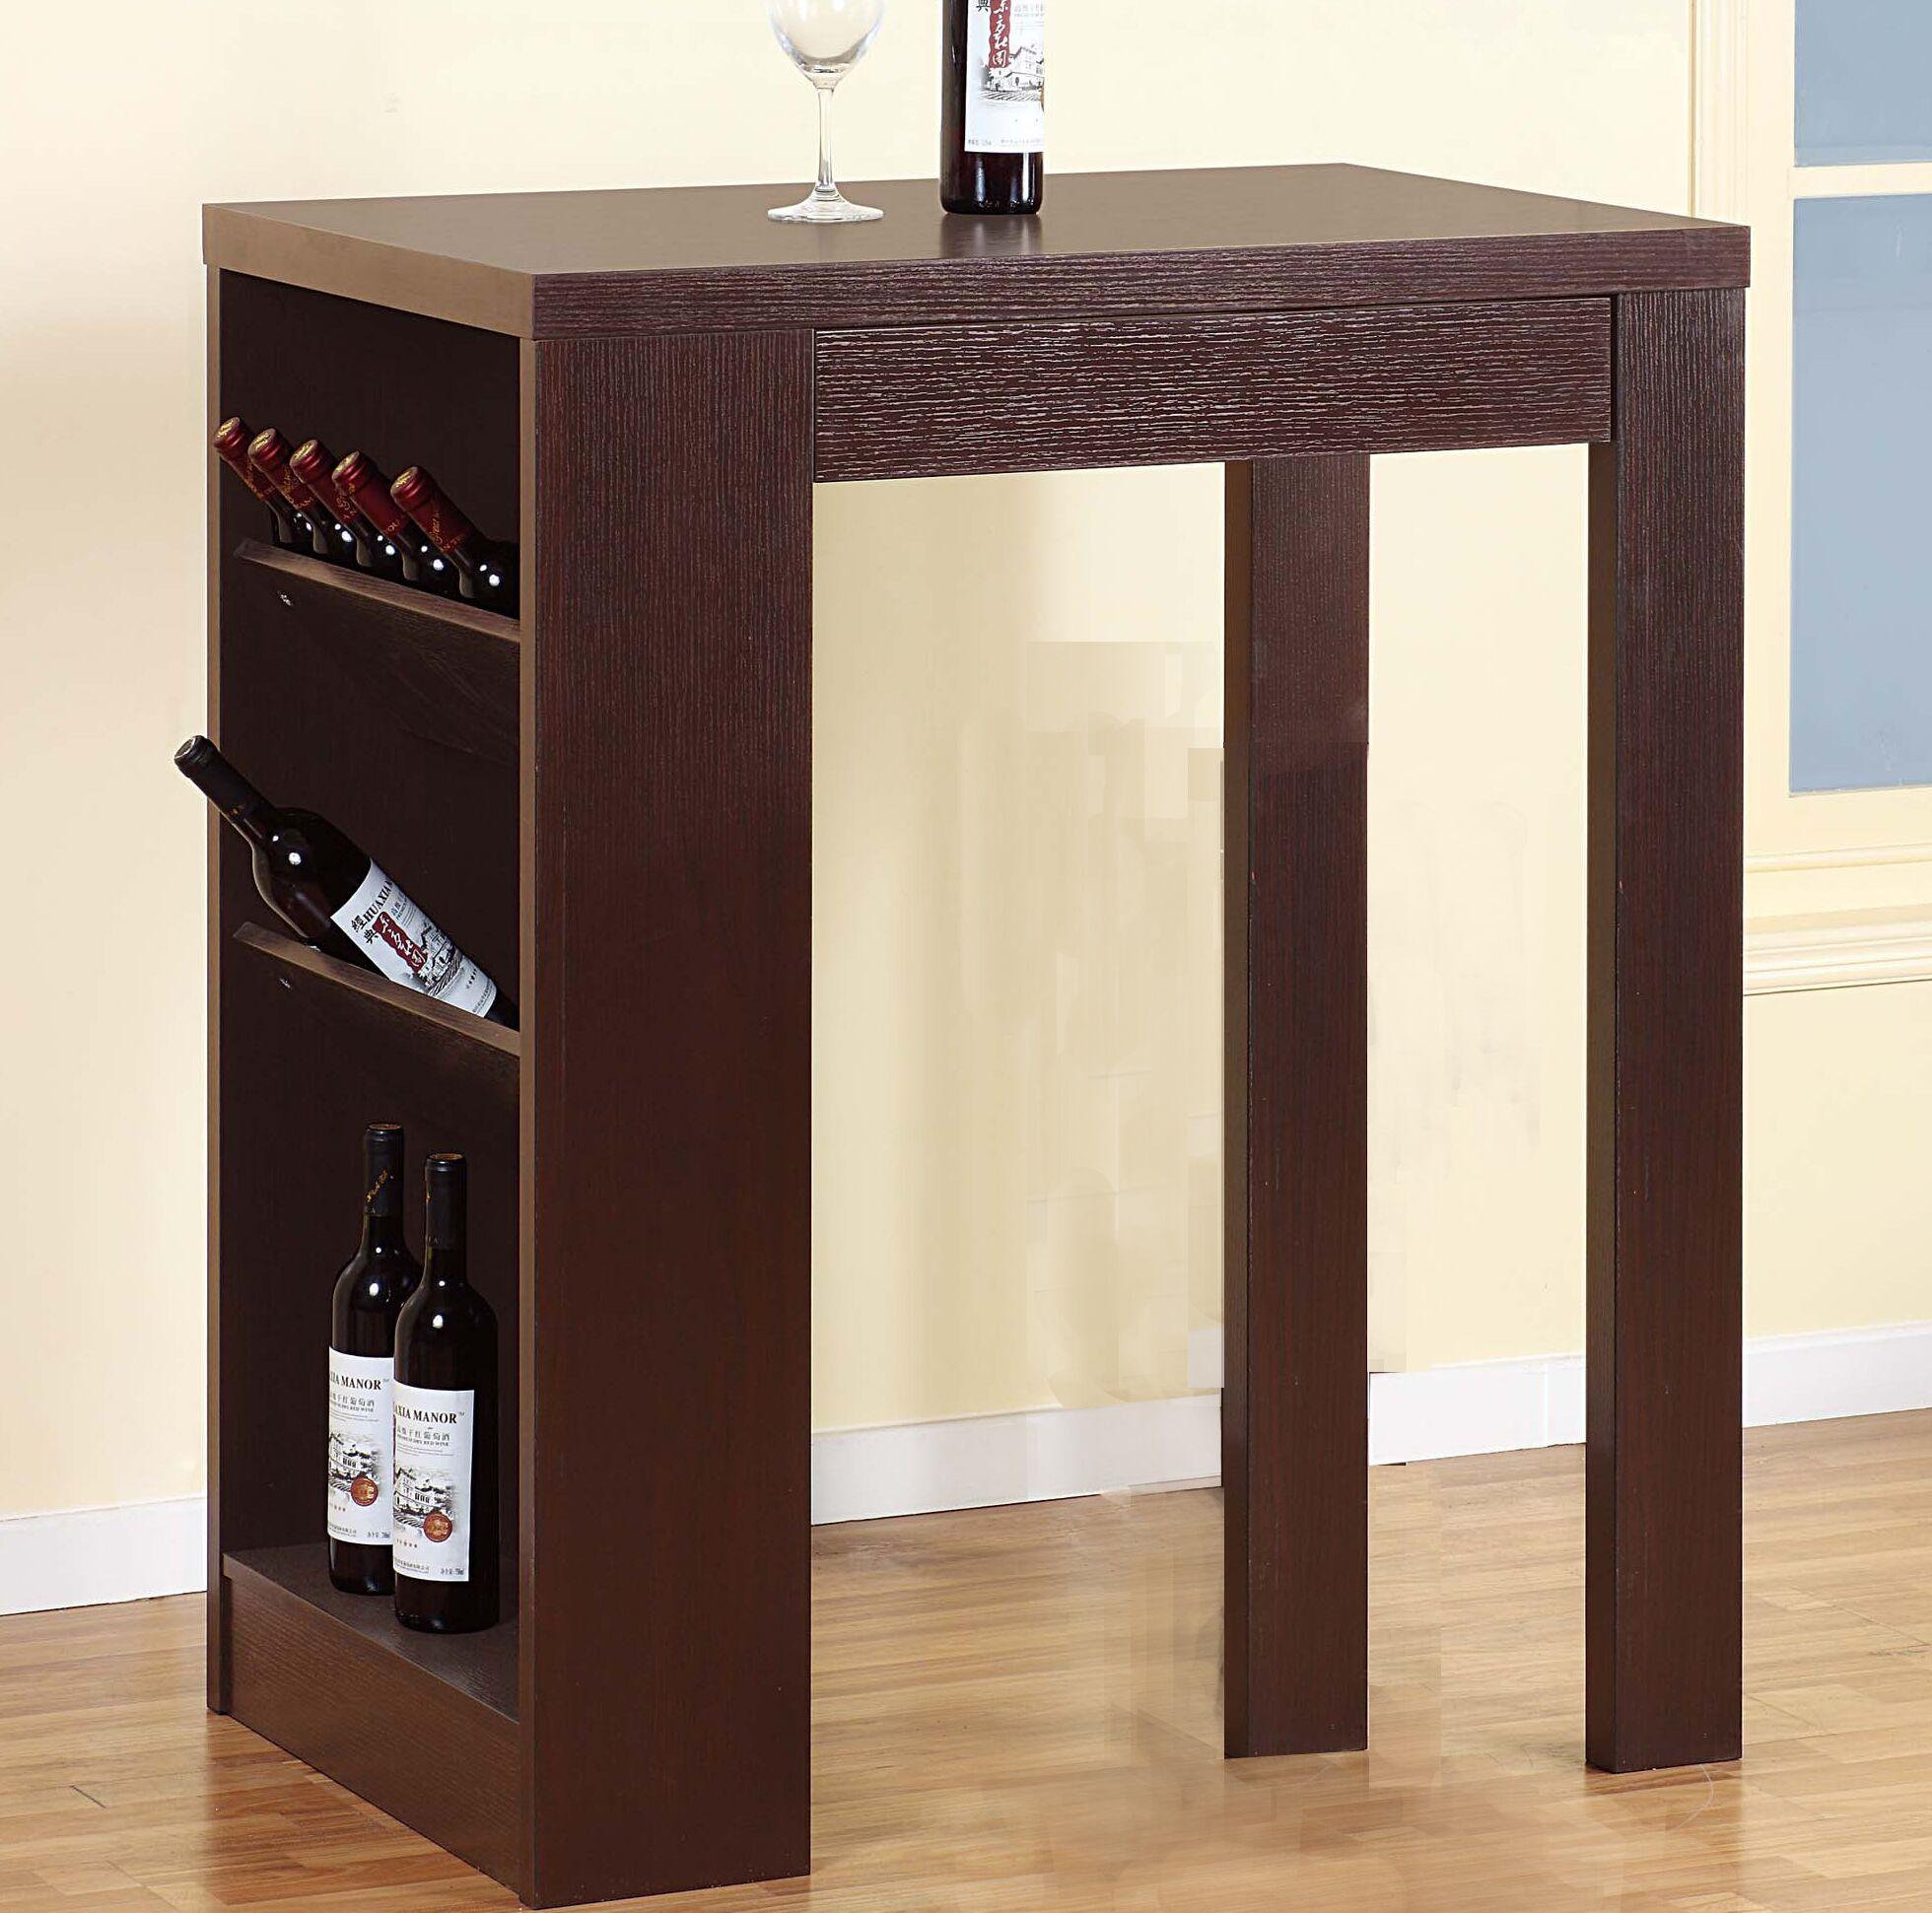 Waites Stylish Bar with Wine Storage